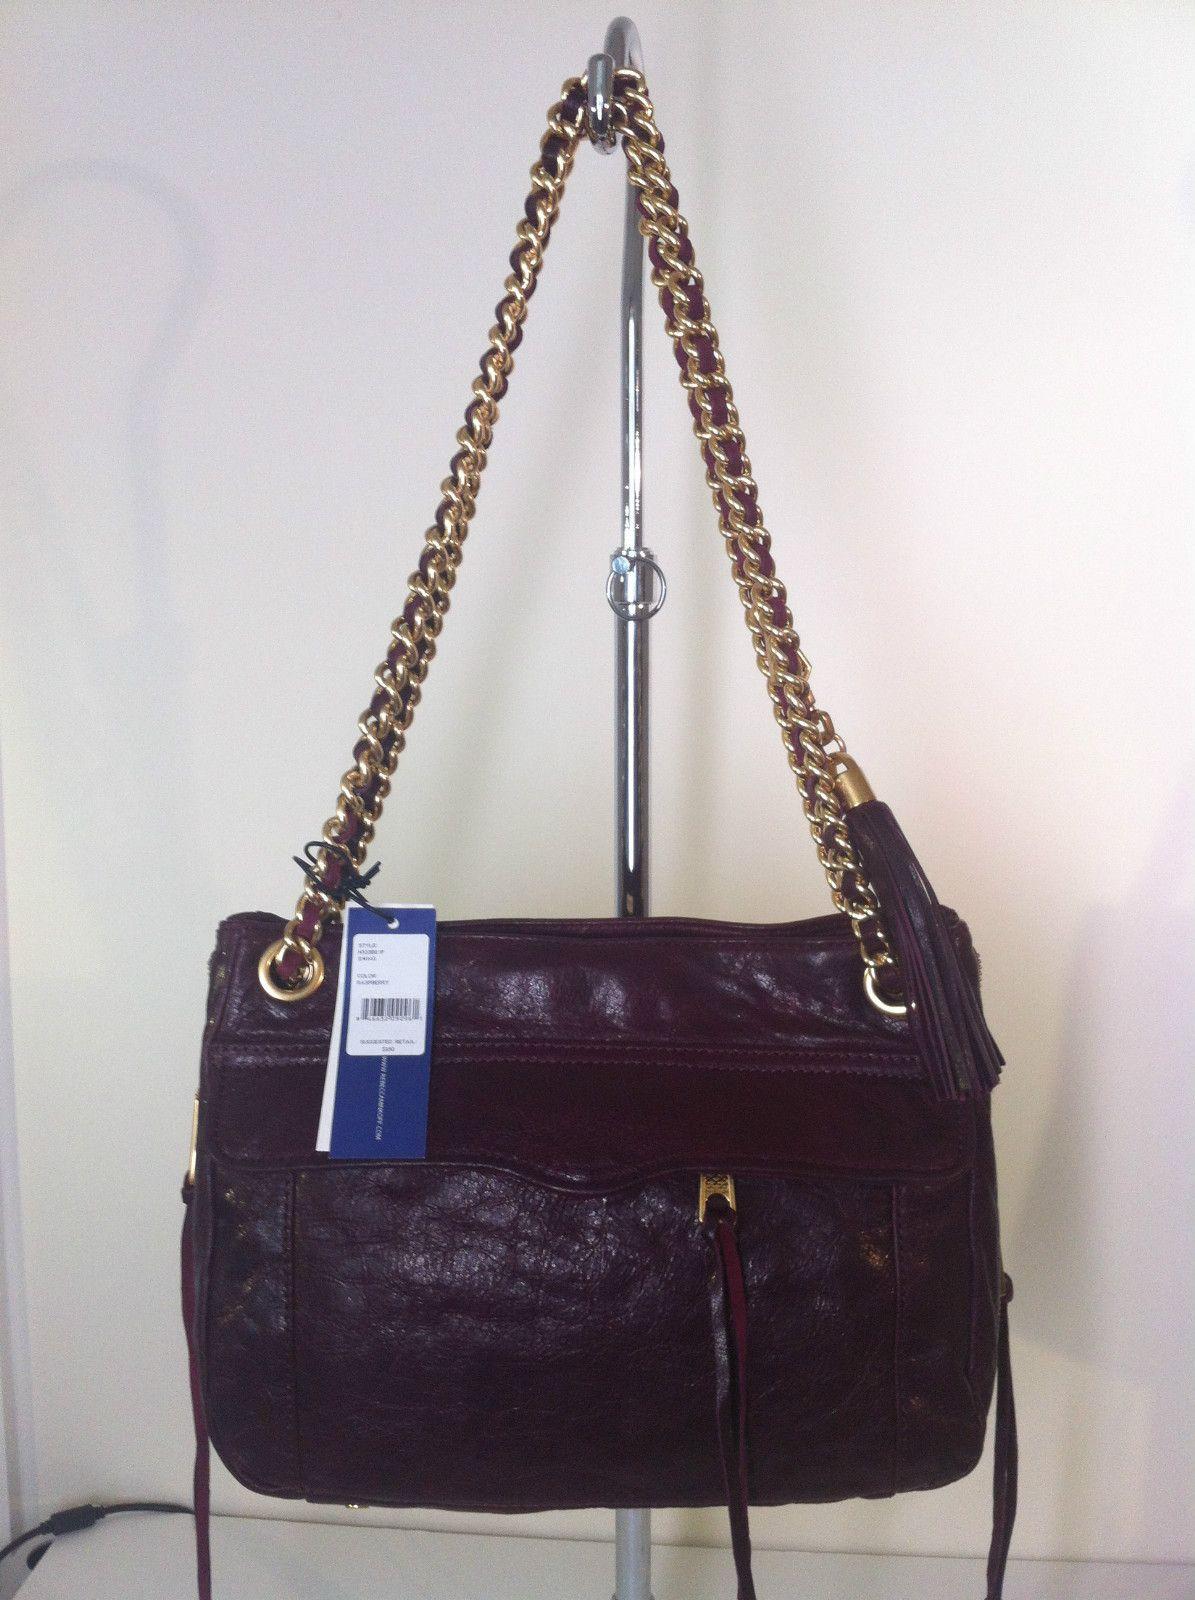 90f7d9afce84 NWT Rebecca Minkoff Swing Double Chain Strap Shoulder Bag Raspberry  324.99